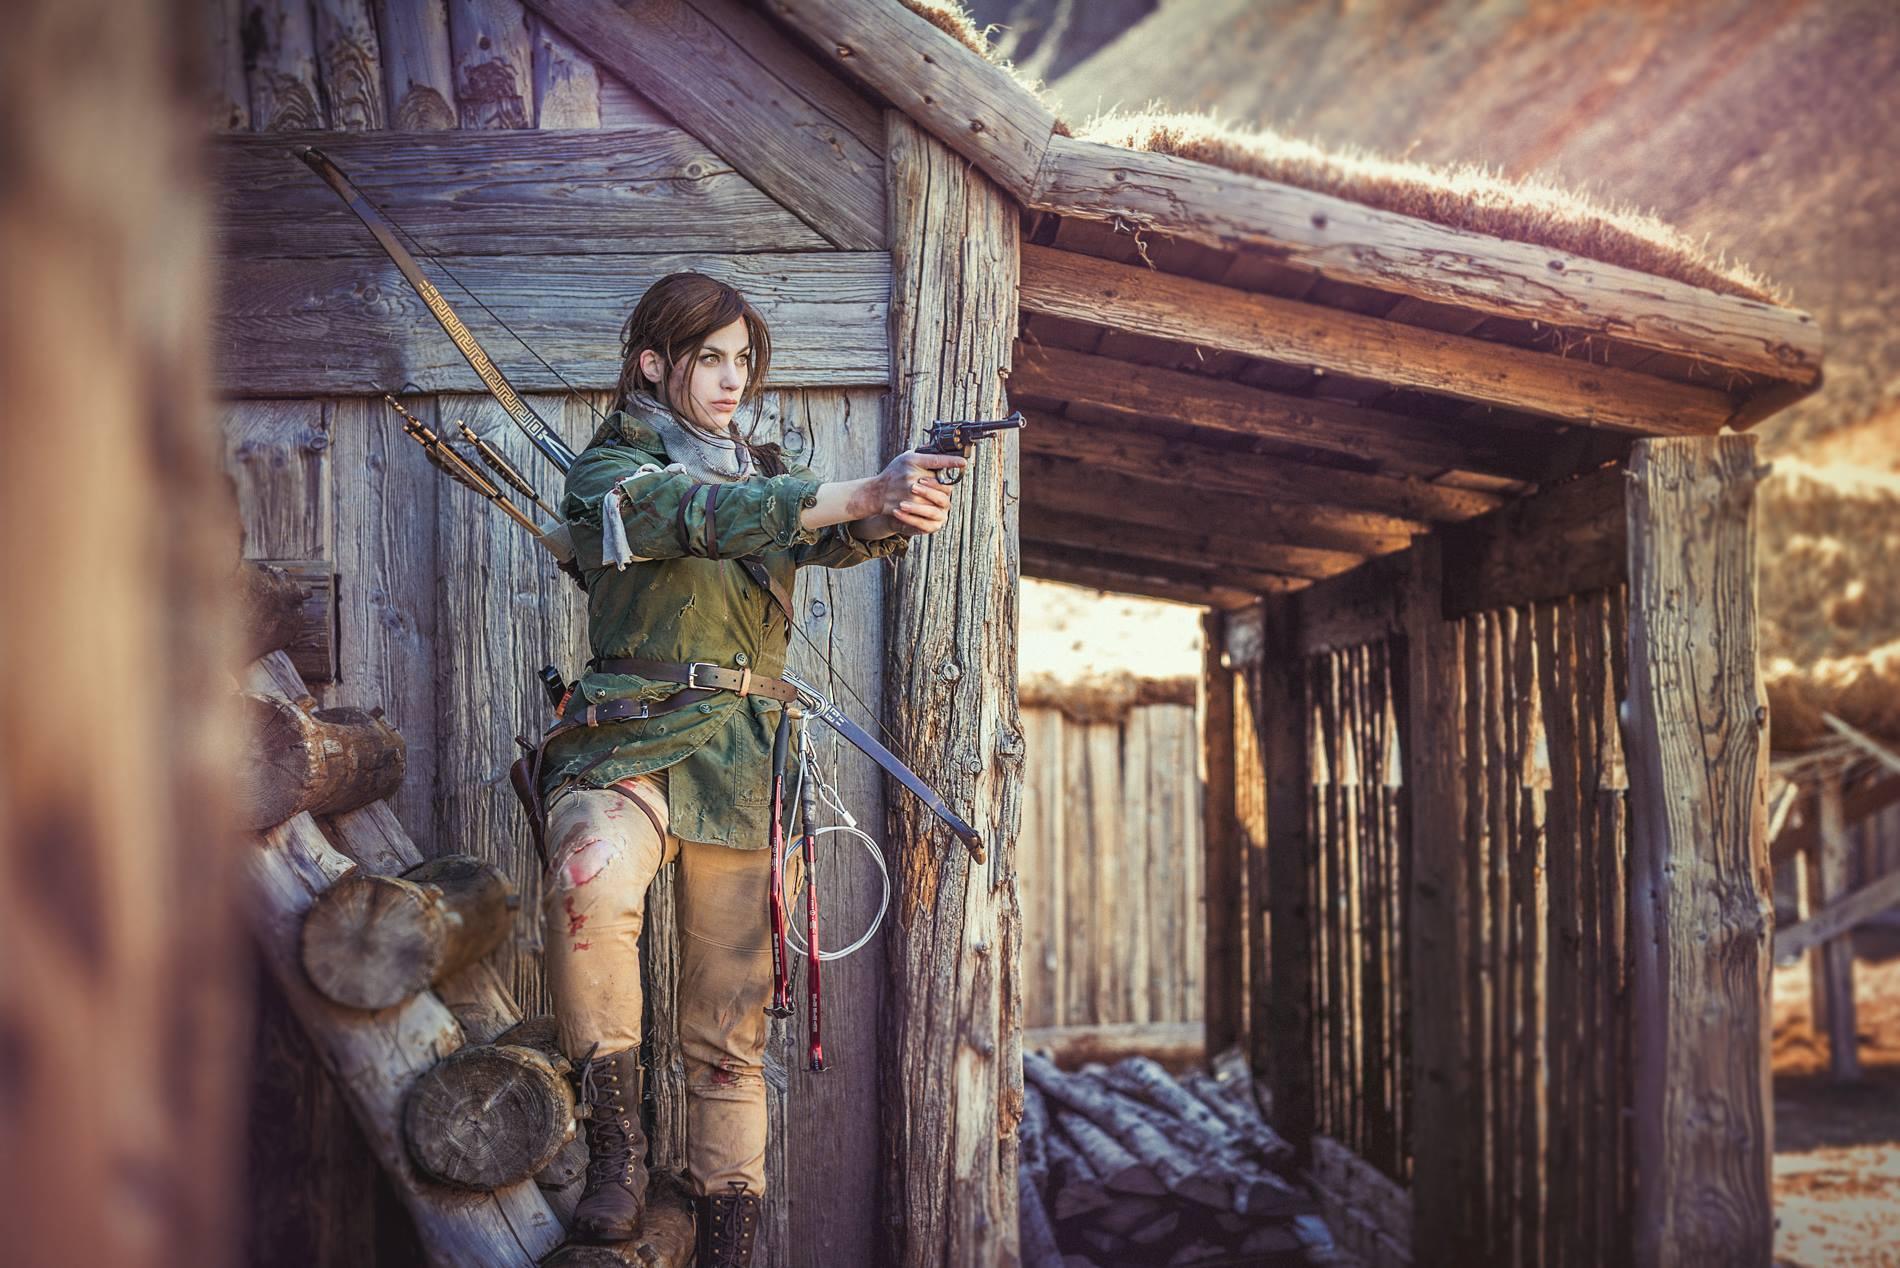 Meagan Marie - Lara Croft